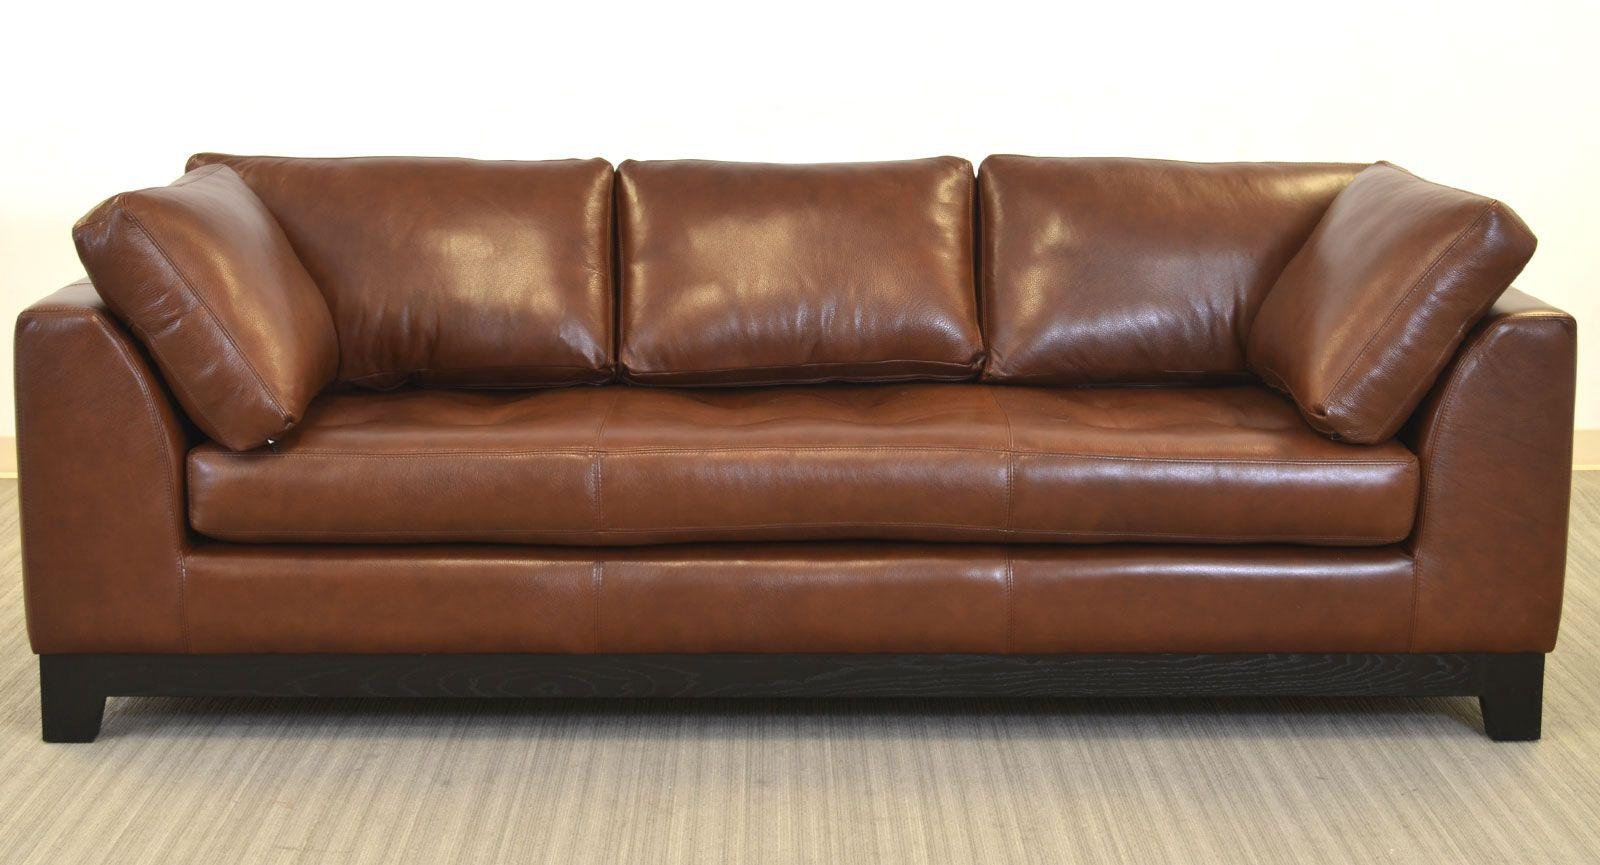 vintage leather sofa company ashton next usa made the arcadia furniture in manufacturing